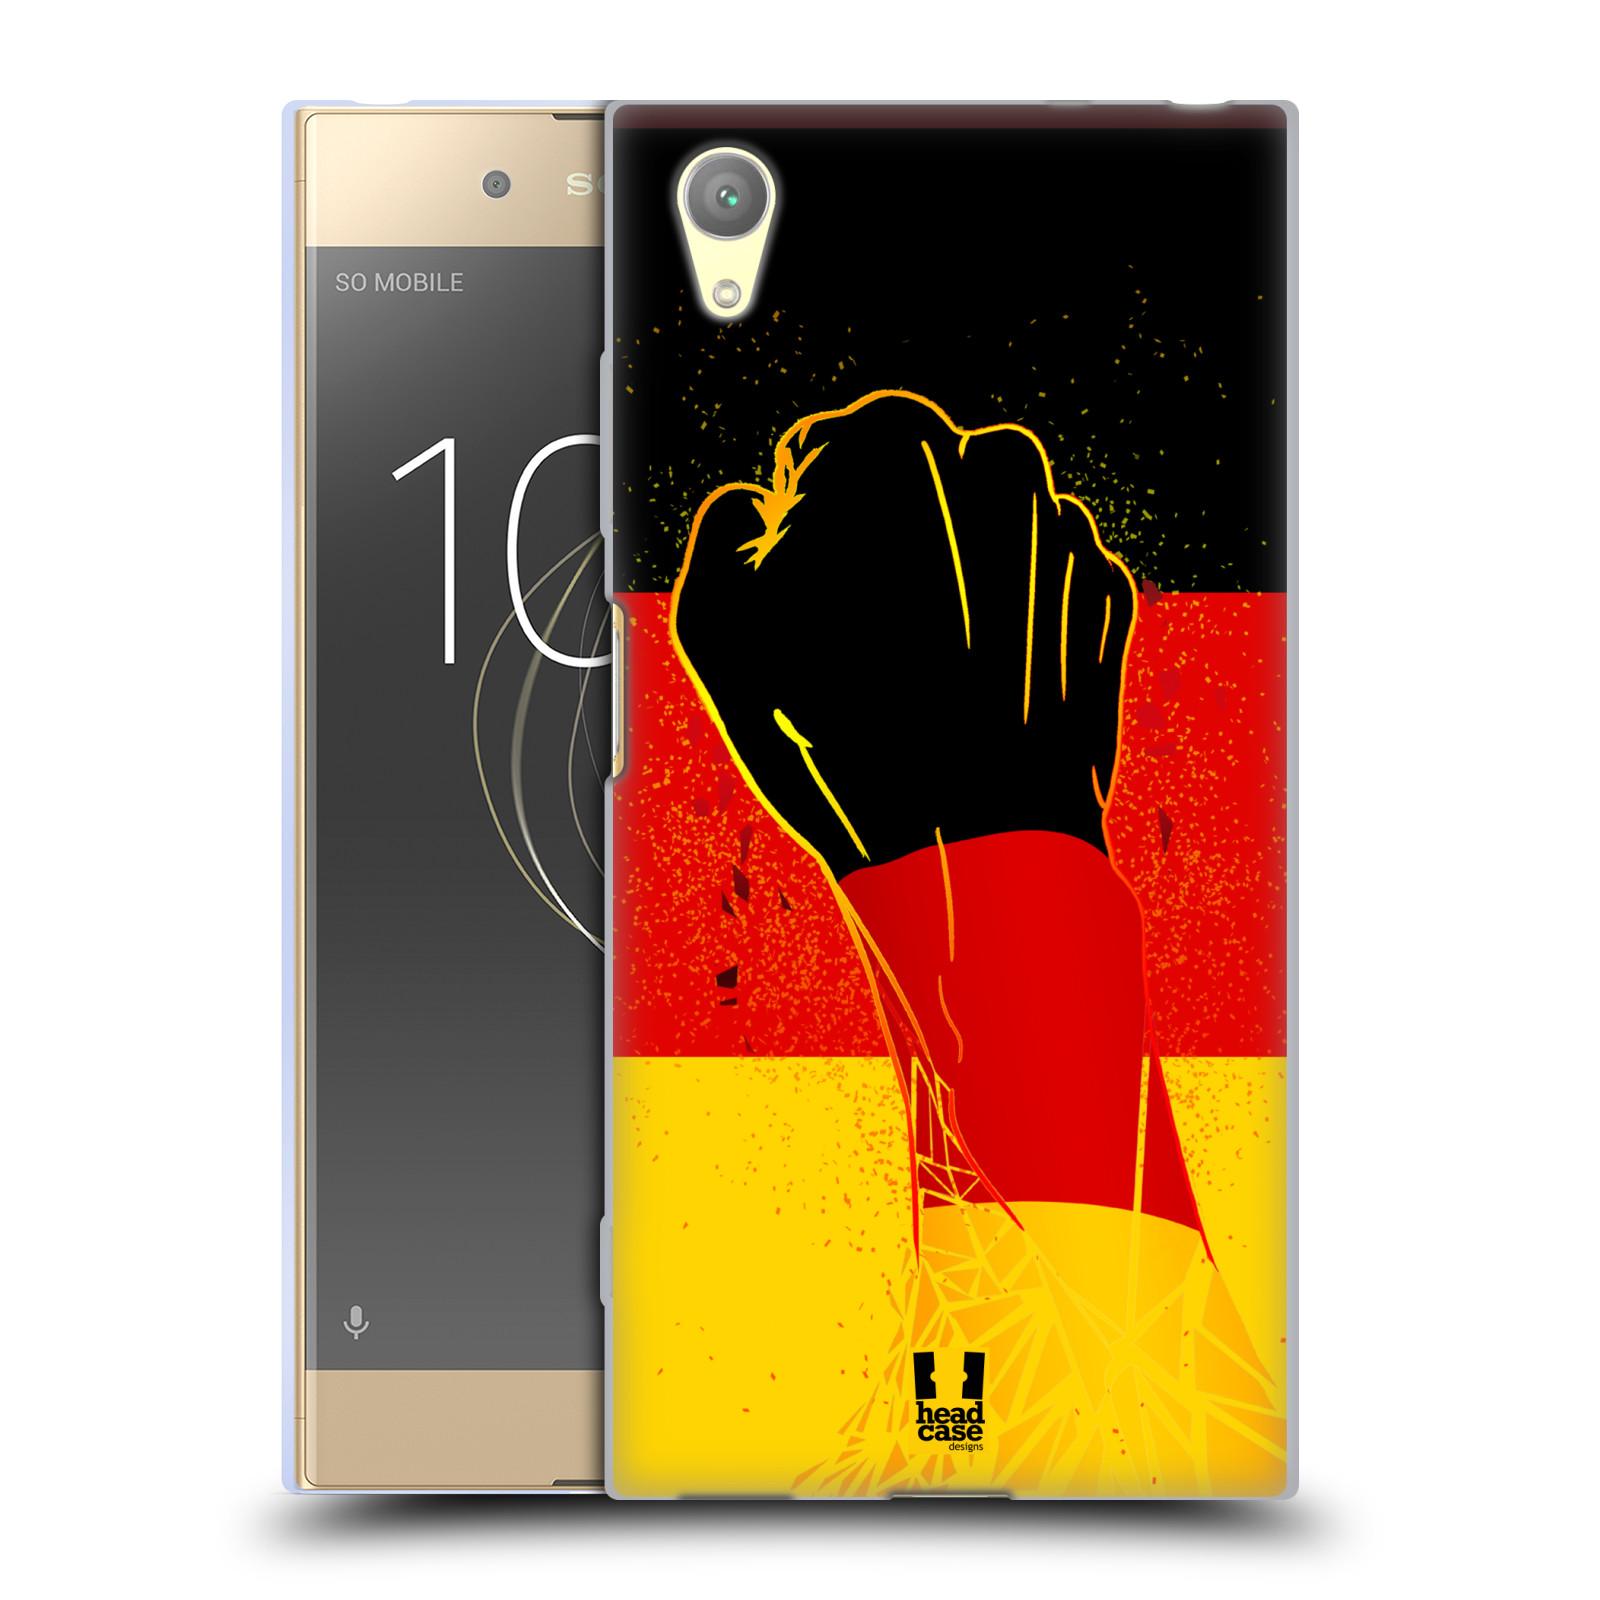 HEAD CASE silikonový obal na mobil Sony Xperia XA1 PLUS Sport fotbal fanoušek ruka